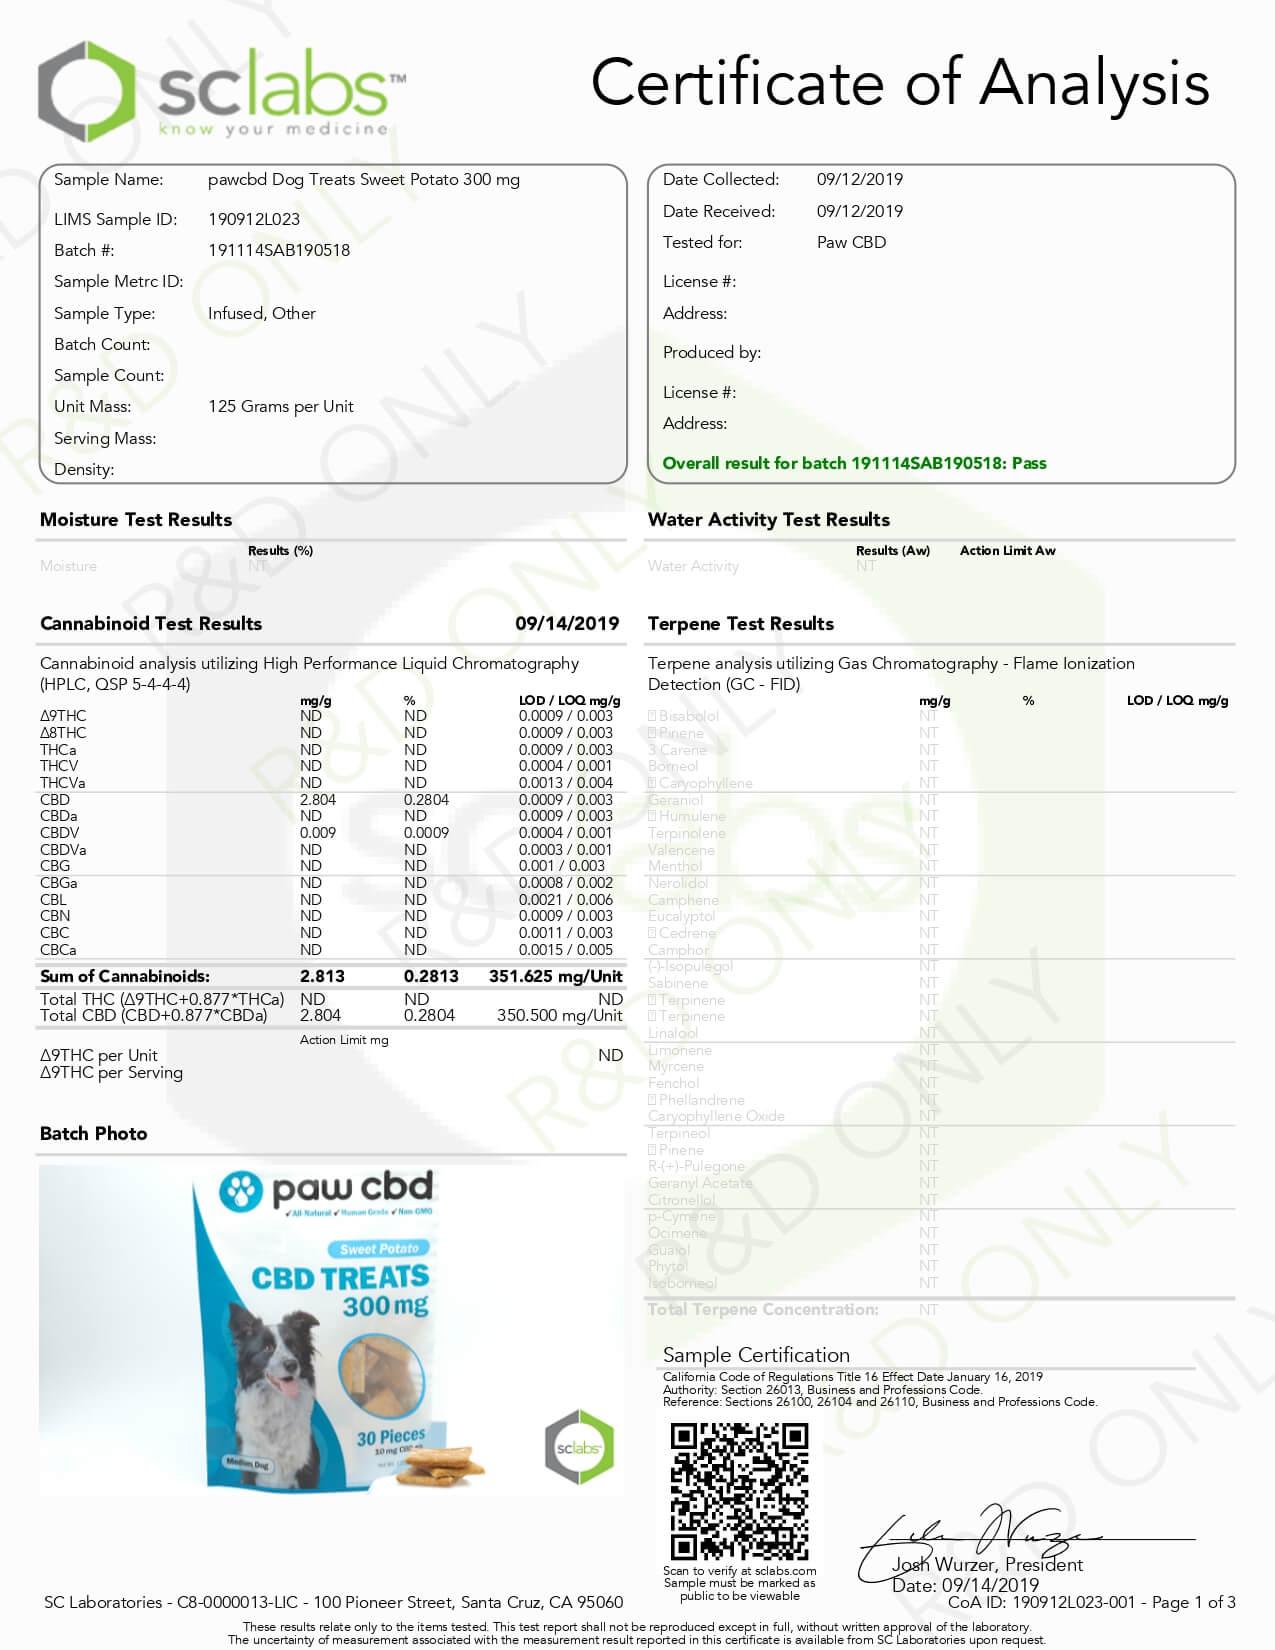 cbdMD CBD Pet Edible Sweet Potato Dog Treats 300mg Lab Report